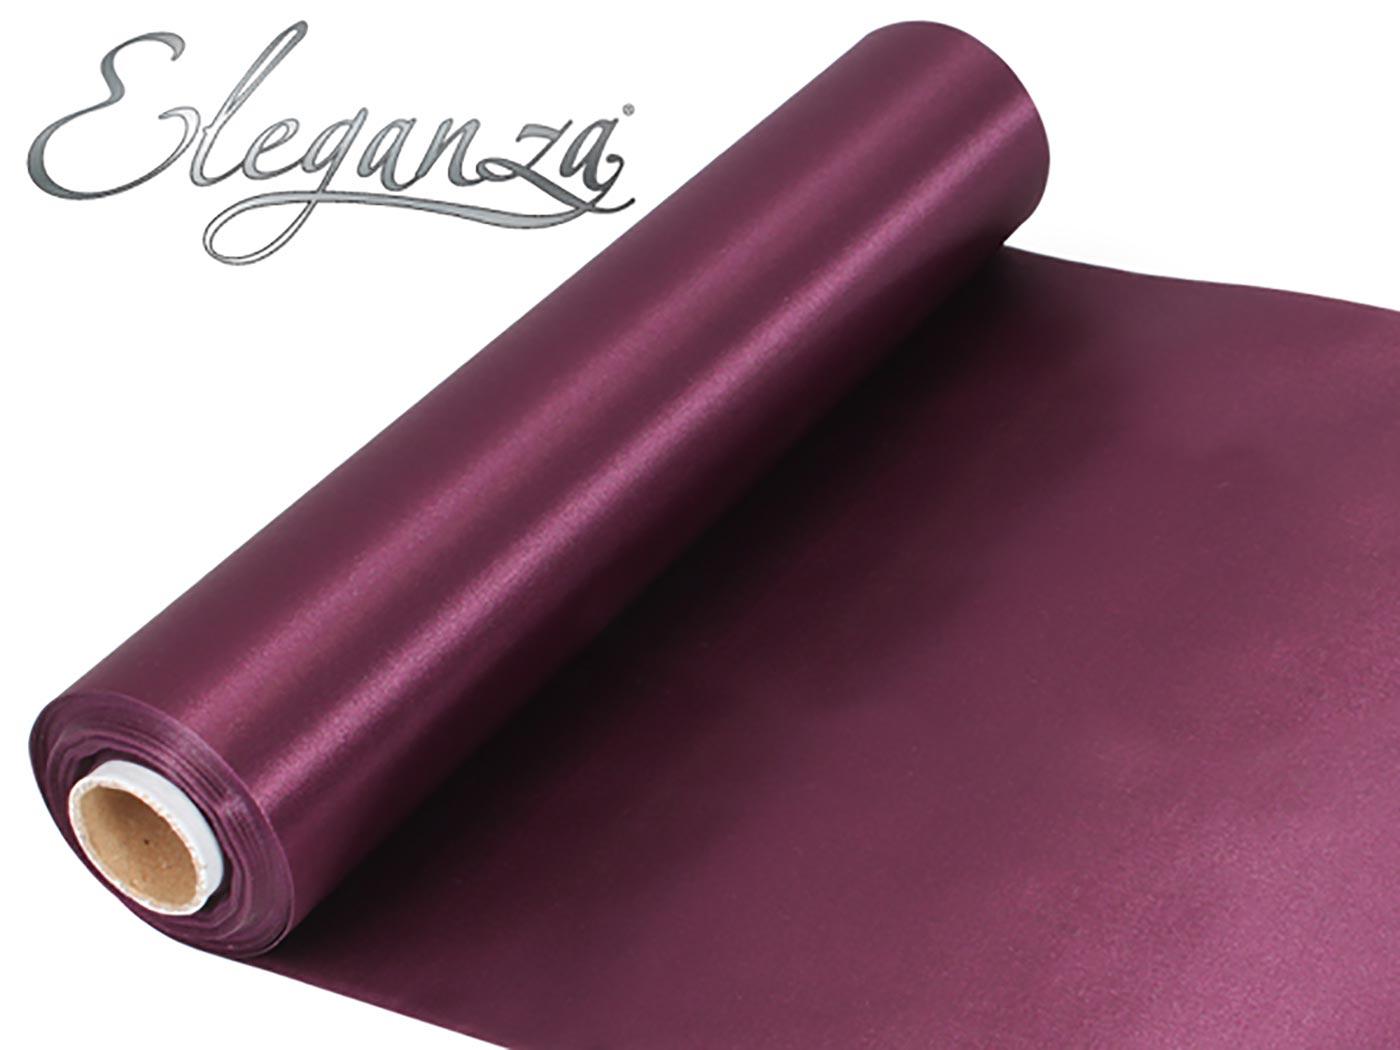 Eleganza Satin Fabric 29cm x 20m Burgundy